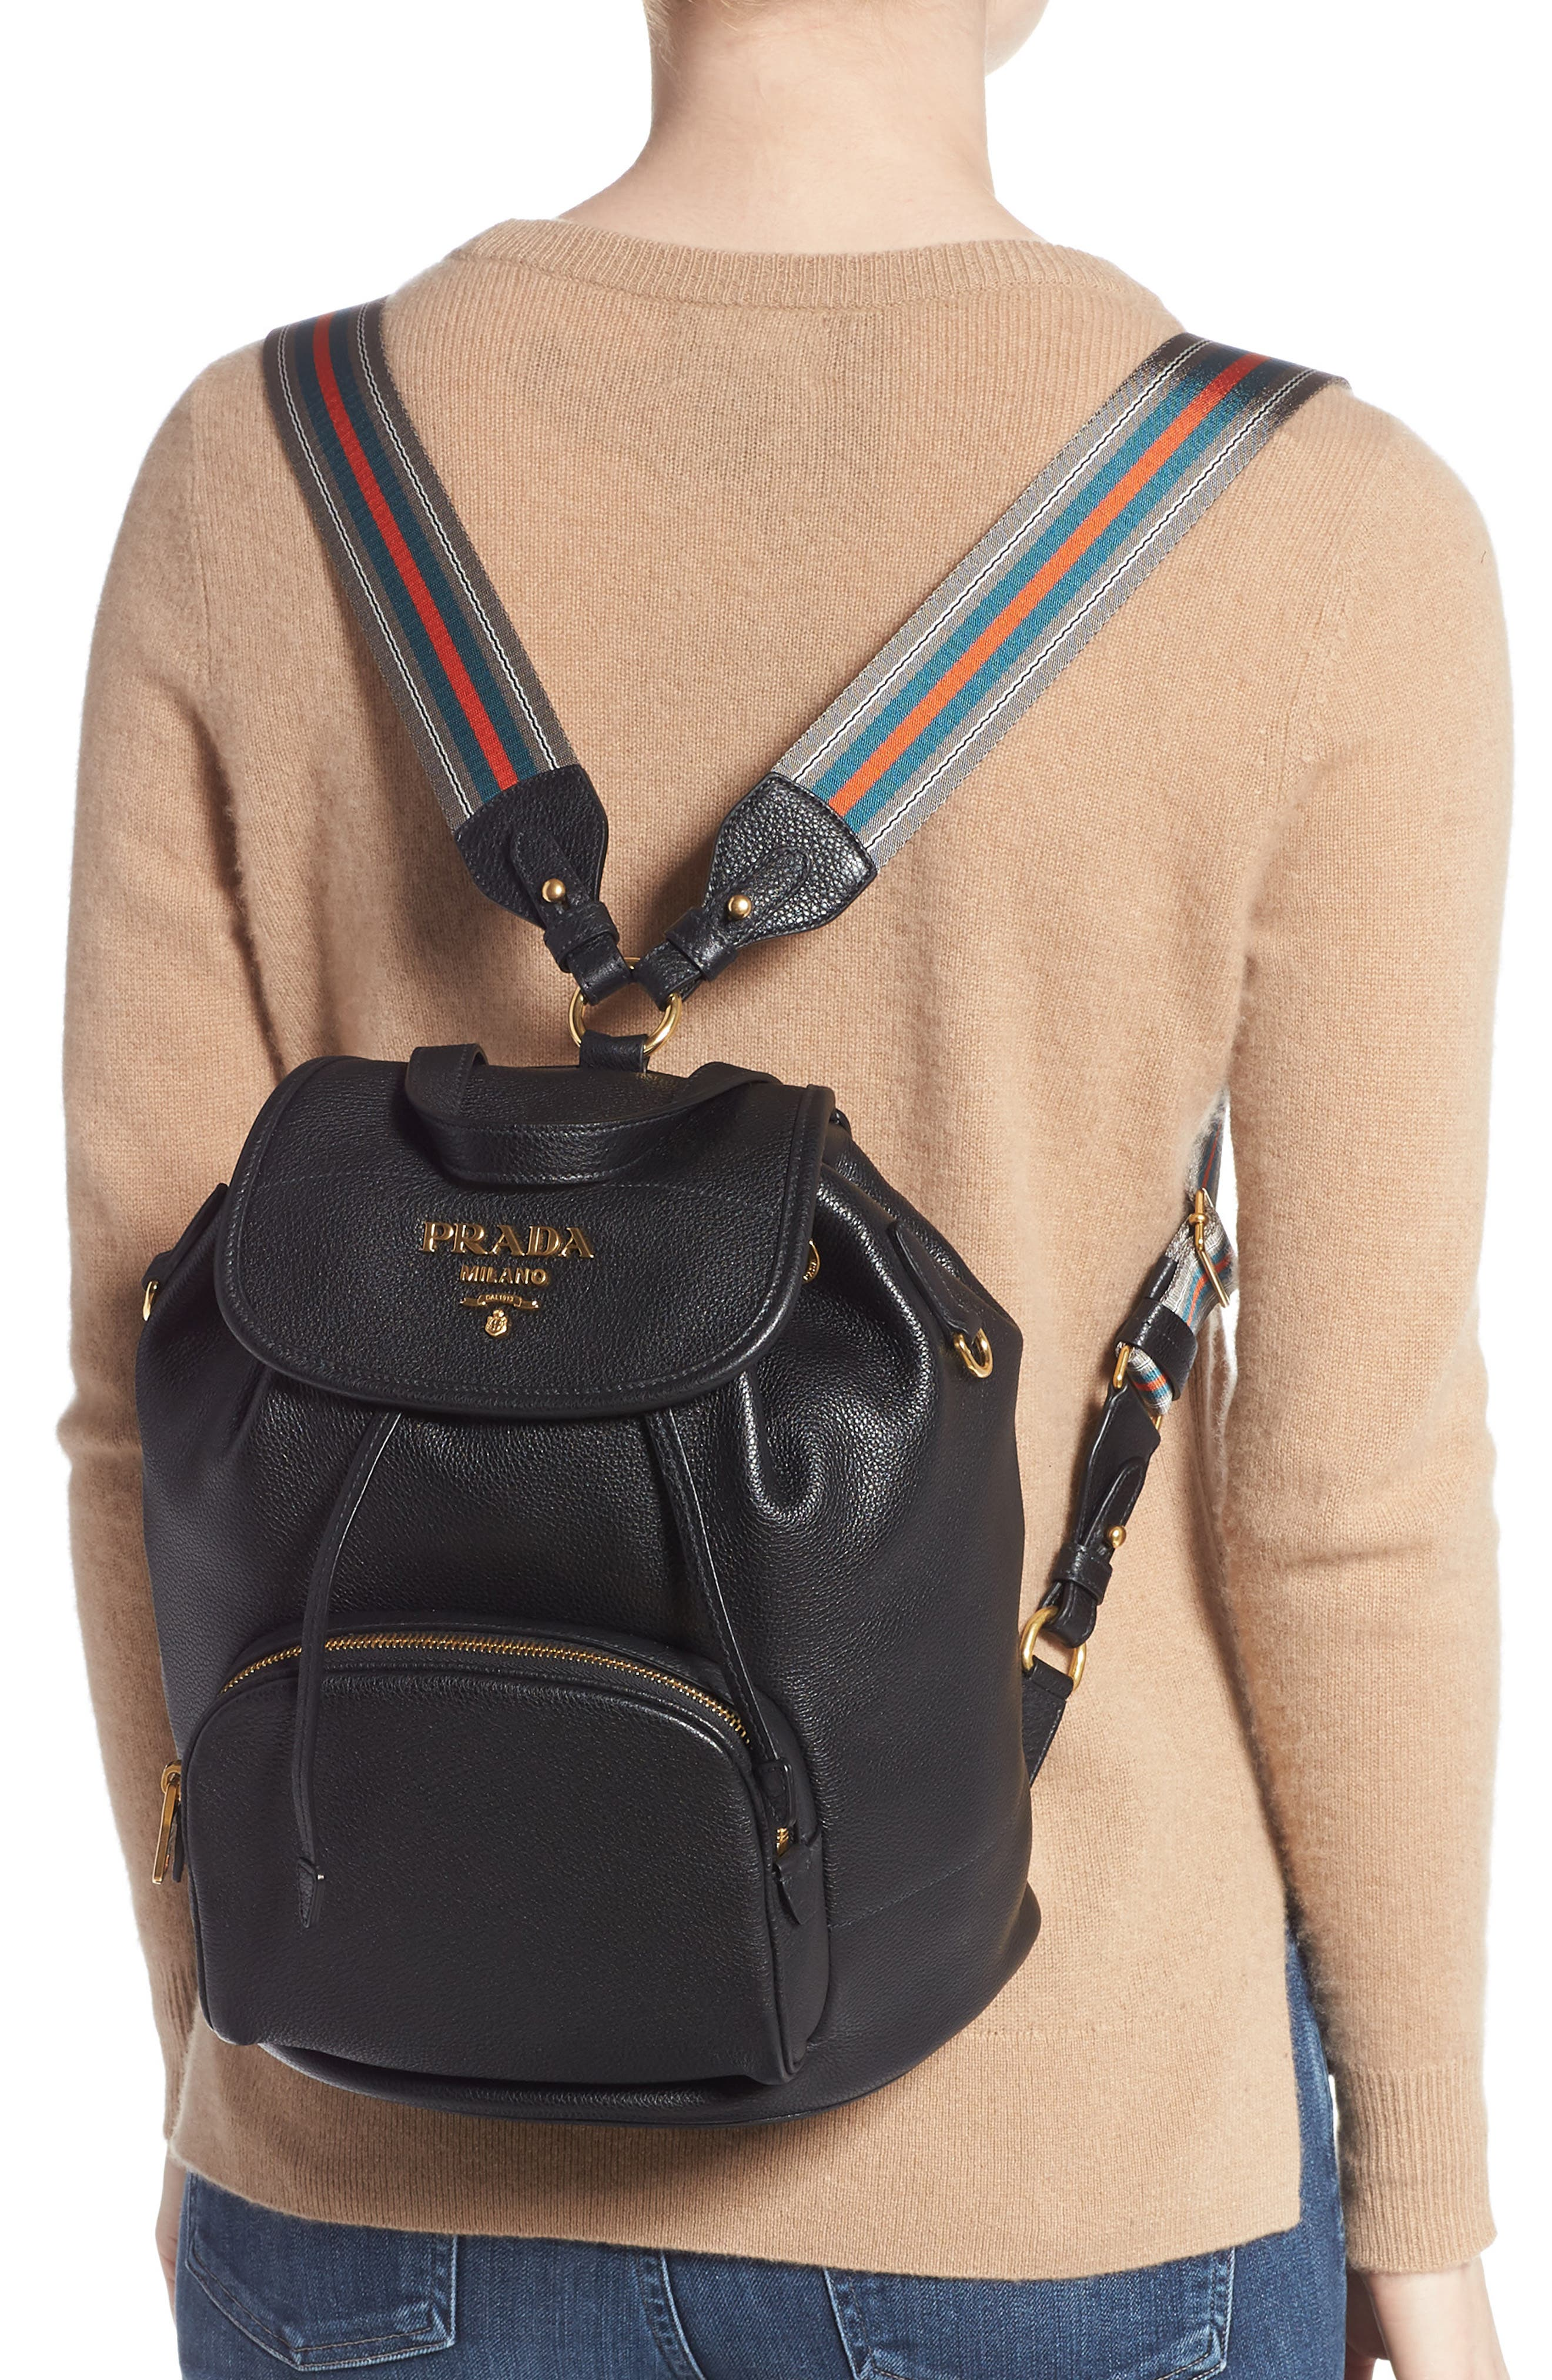 PRADA, Vitello Daino Pebbled Leather Backpack, Alternate thumbnail 2, color, 001